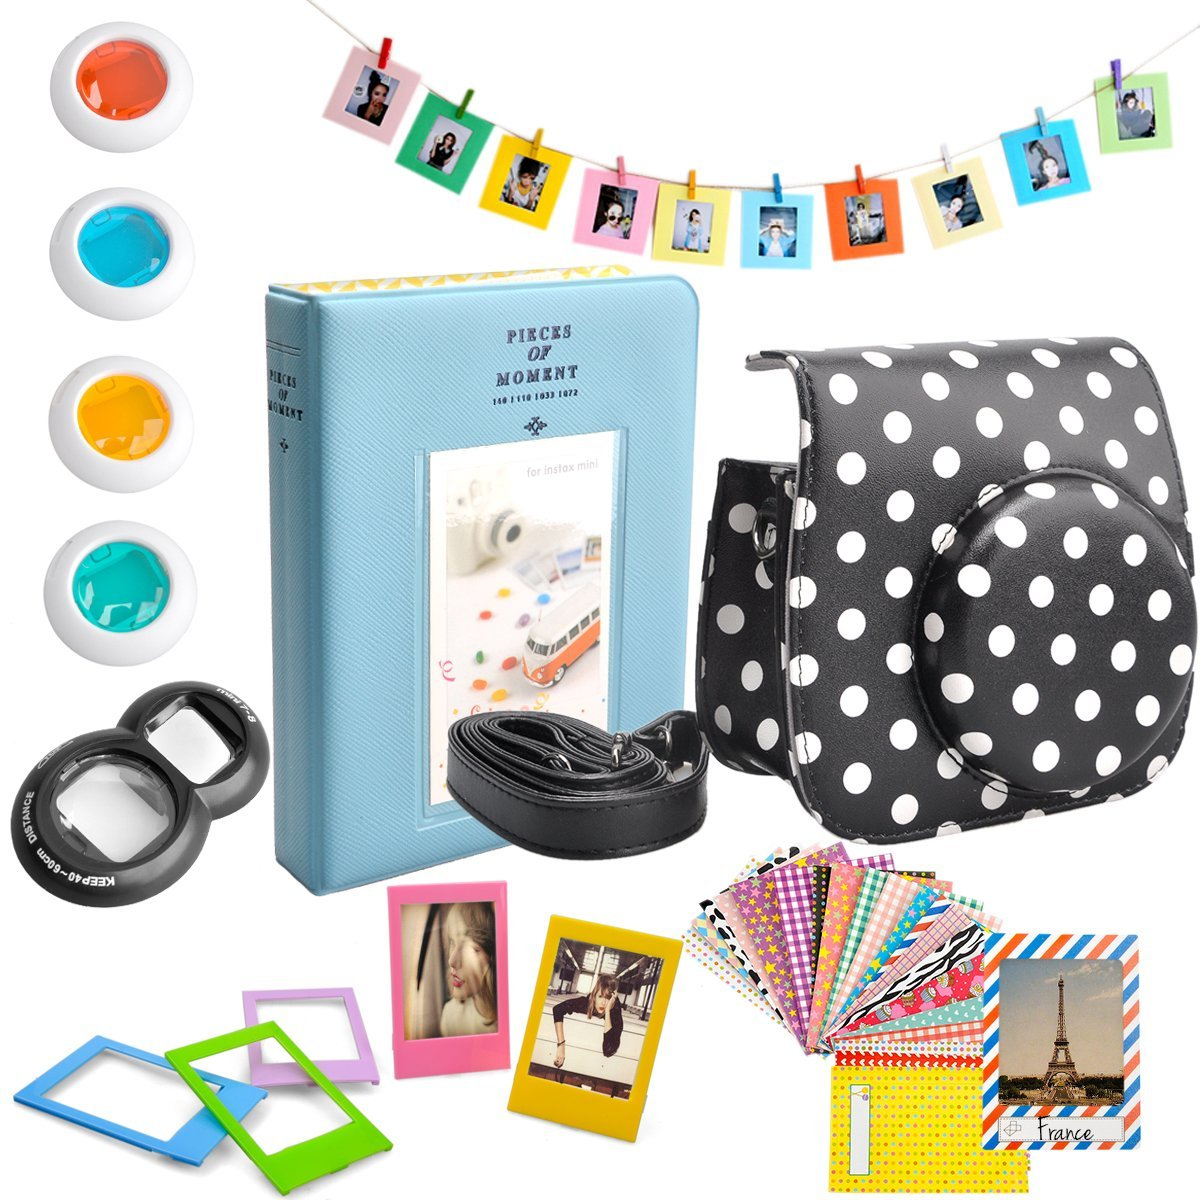 SKmoon 7 in 1 Fujifilm Instax Mini 8 Instant Film Camera Accessories Bundles Set [Camera Case/ Album/ Selfie Lens/ Close-Up Lens/ Frames/ Film Frames/ Stickers](Black/ white dots)